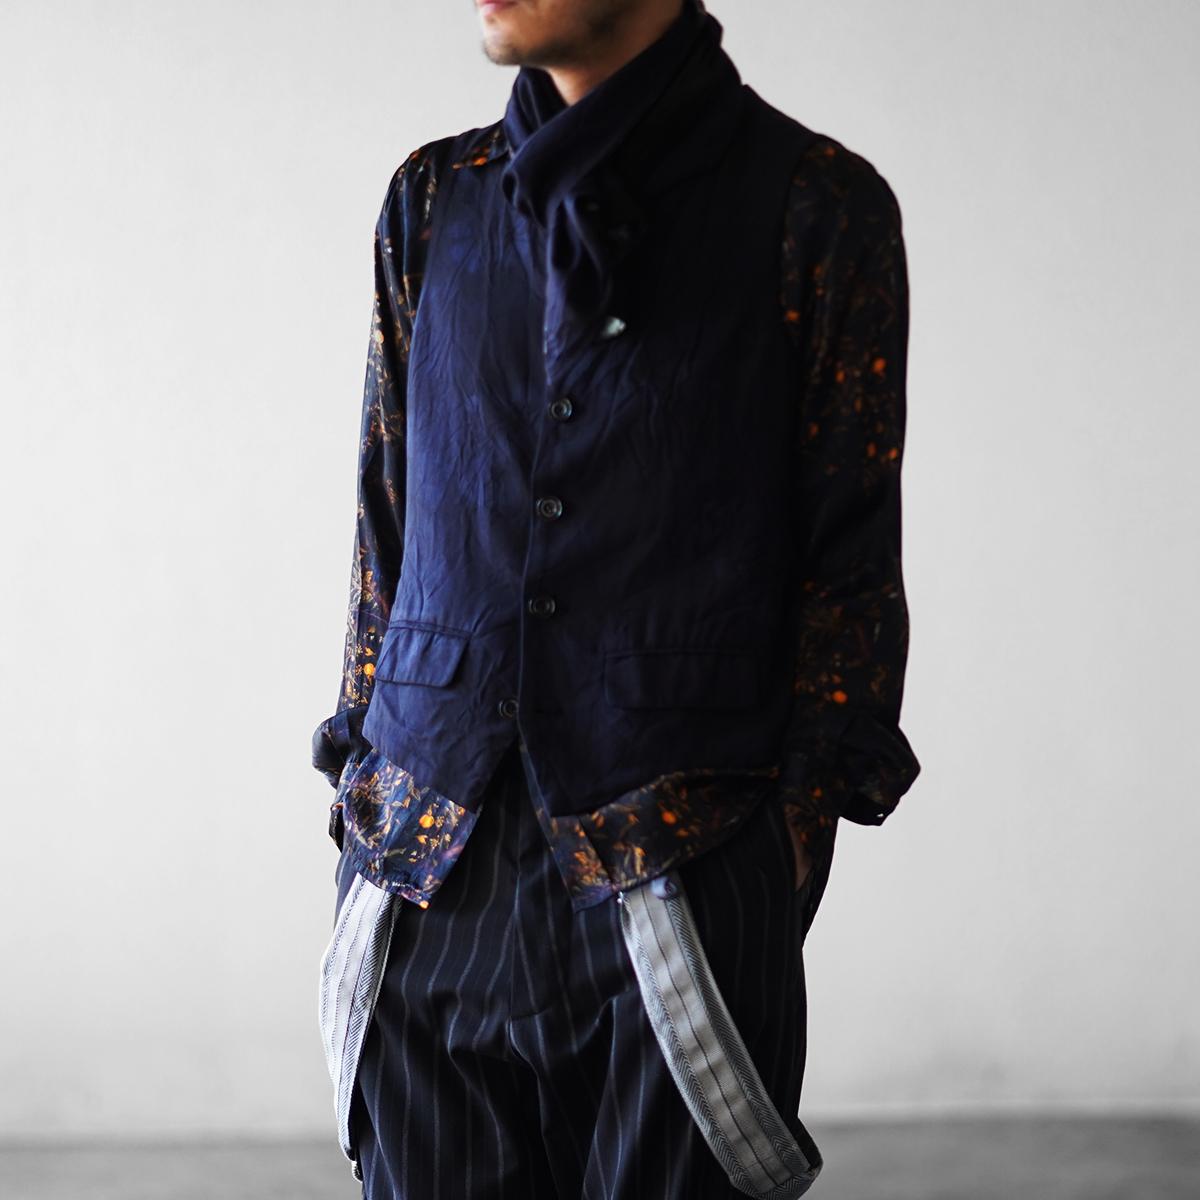 Geoffrey B.Small  handmade 19th century s-b 5-button tailored waistcoat with scarf